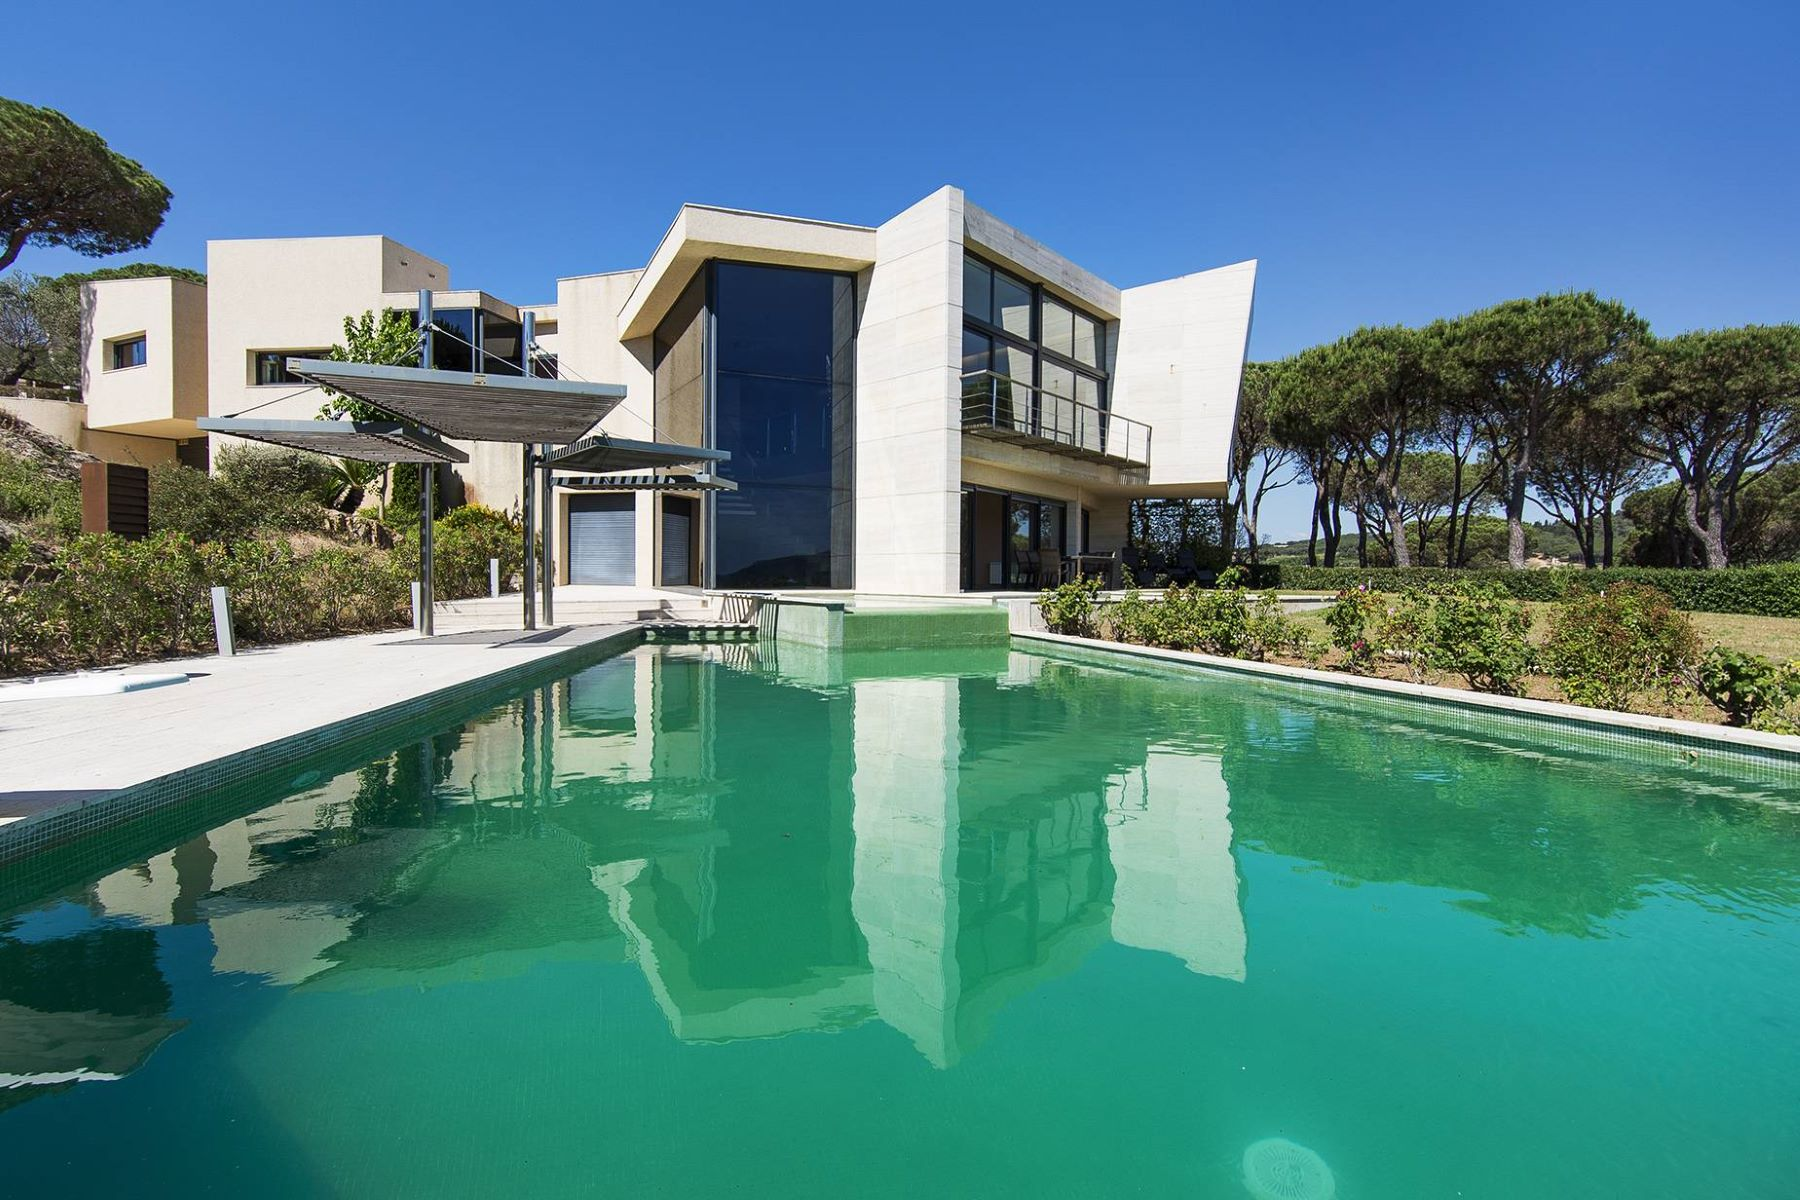 Casa para uma família para Venda às Fantastic villa in a quiet urbanization Sant Feliu De Guixols, Costa Brava, 17220 Espanha